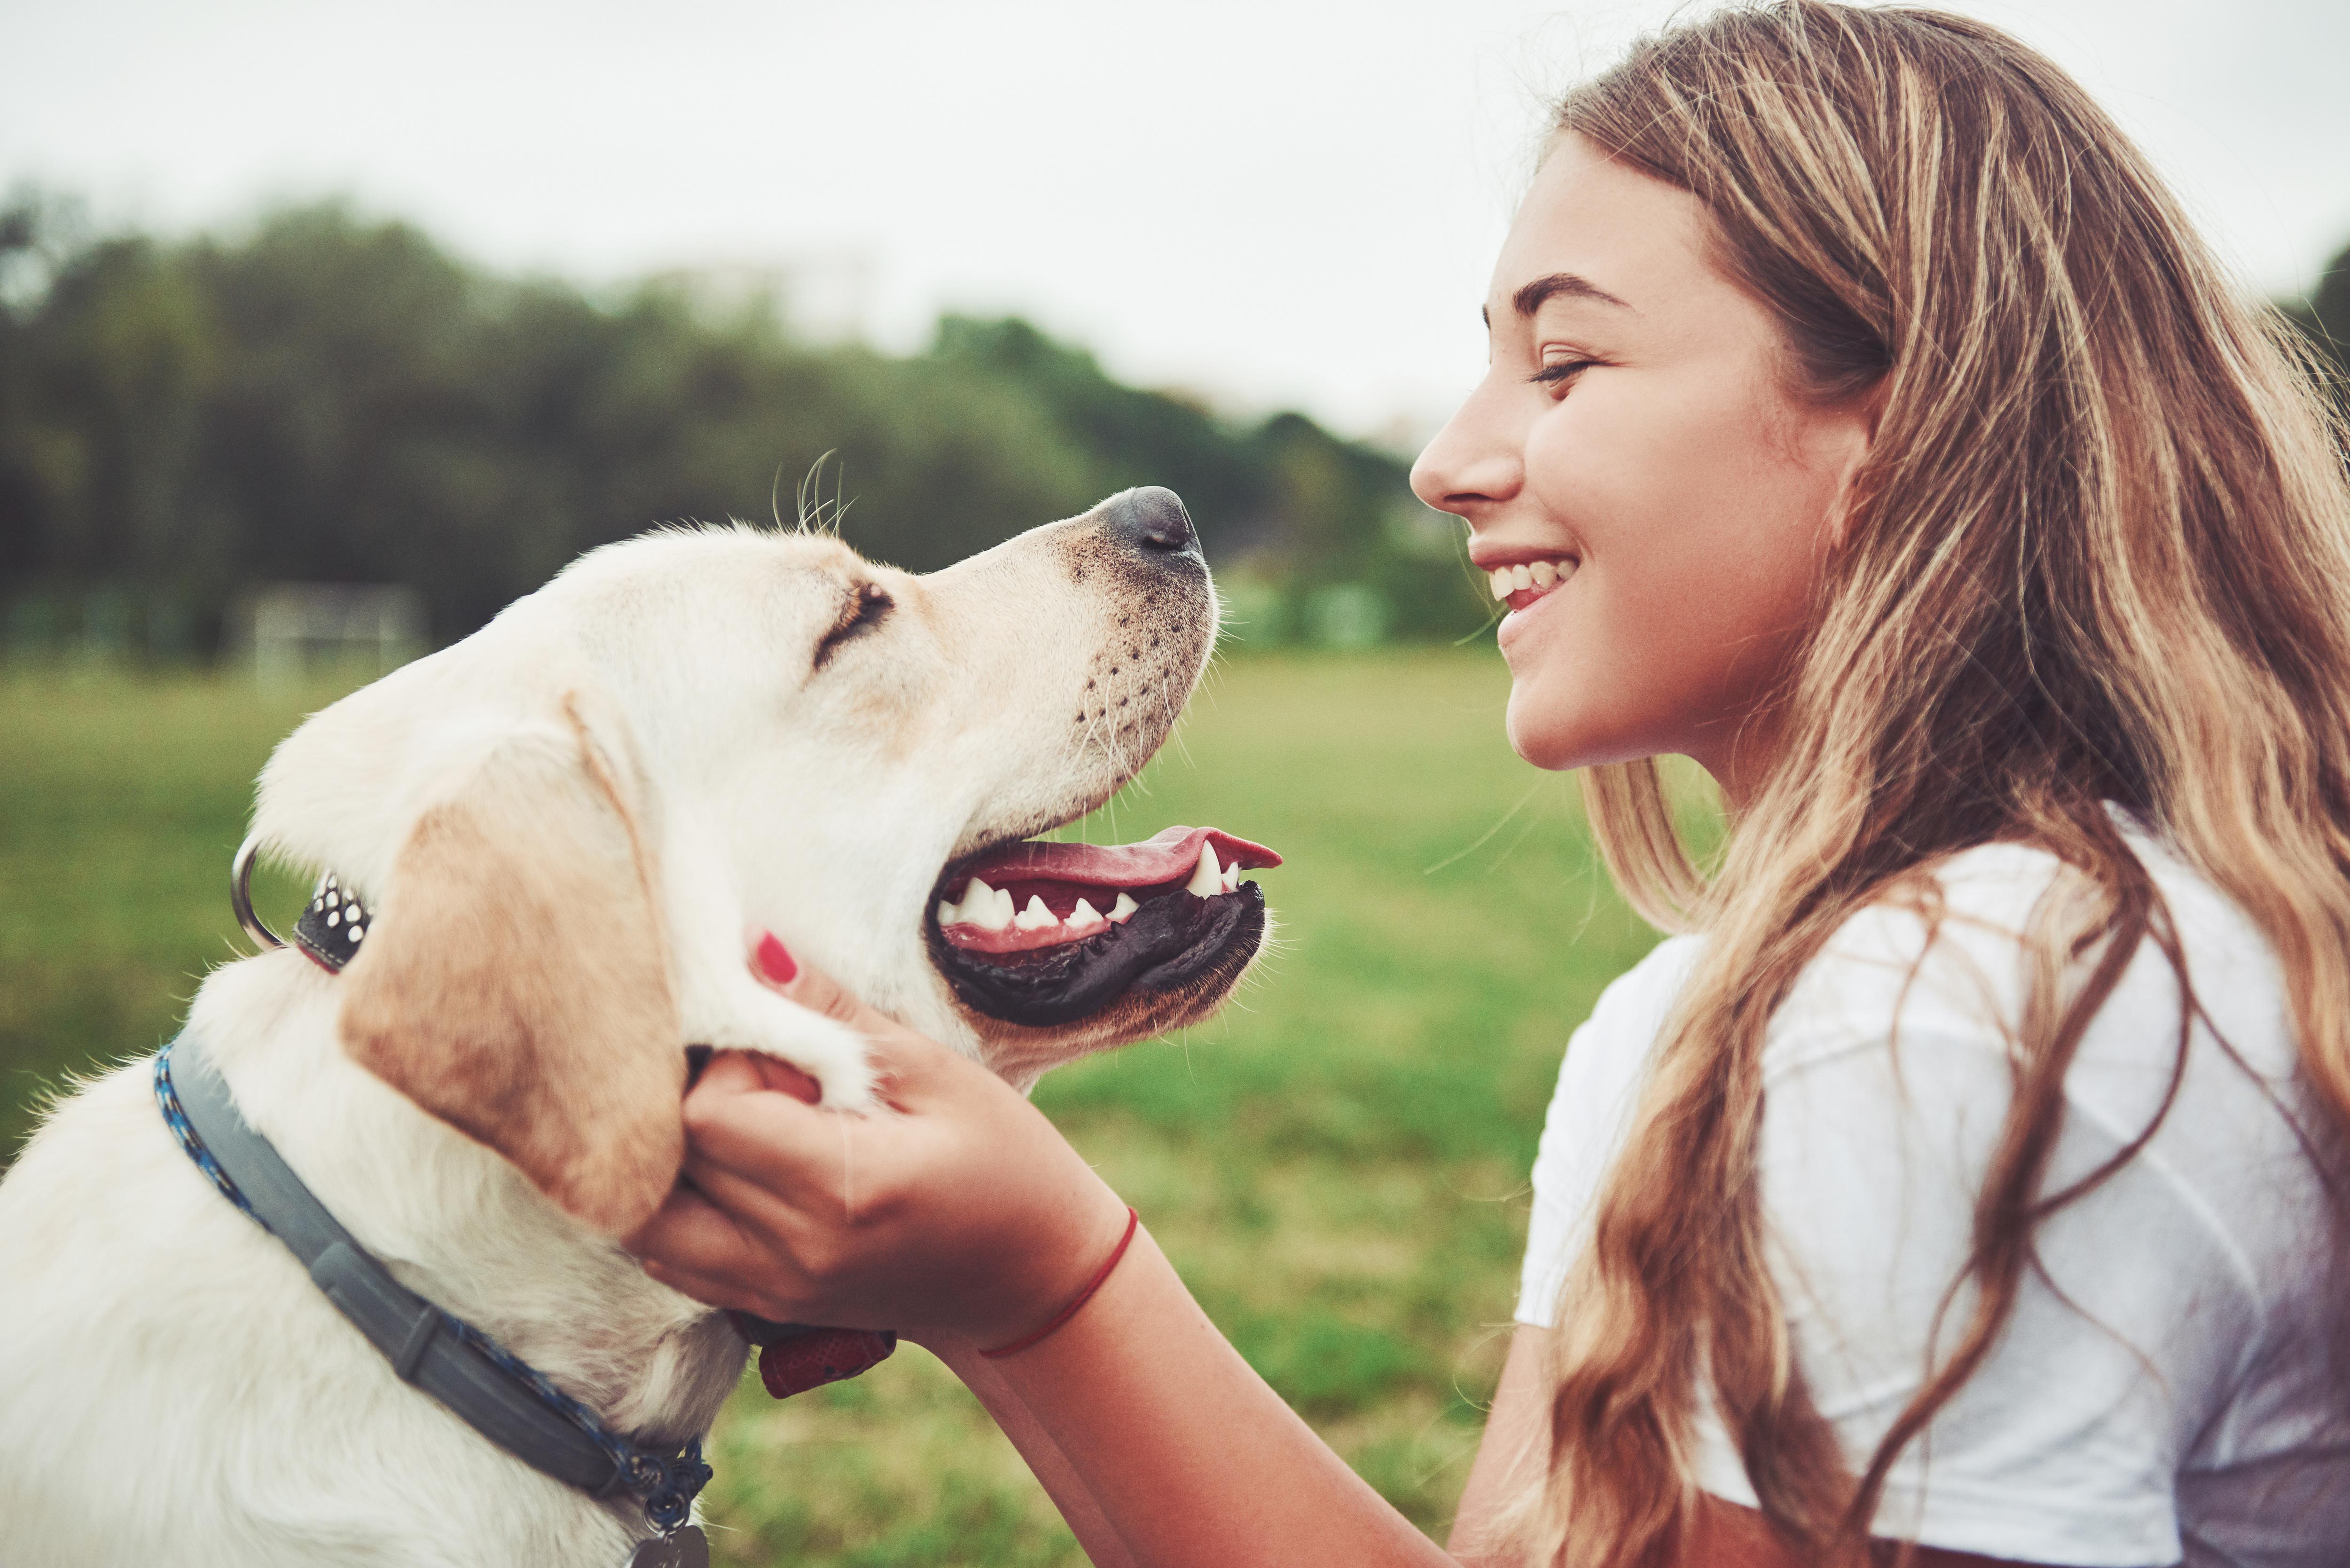 7 Ways To Keep Your Dog Safe Outdoors